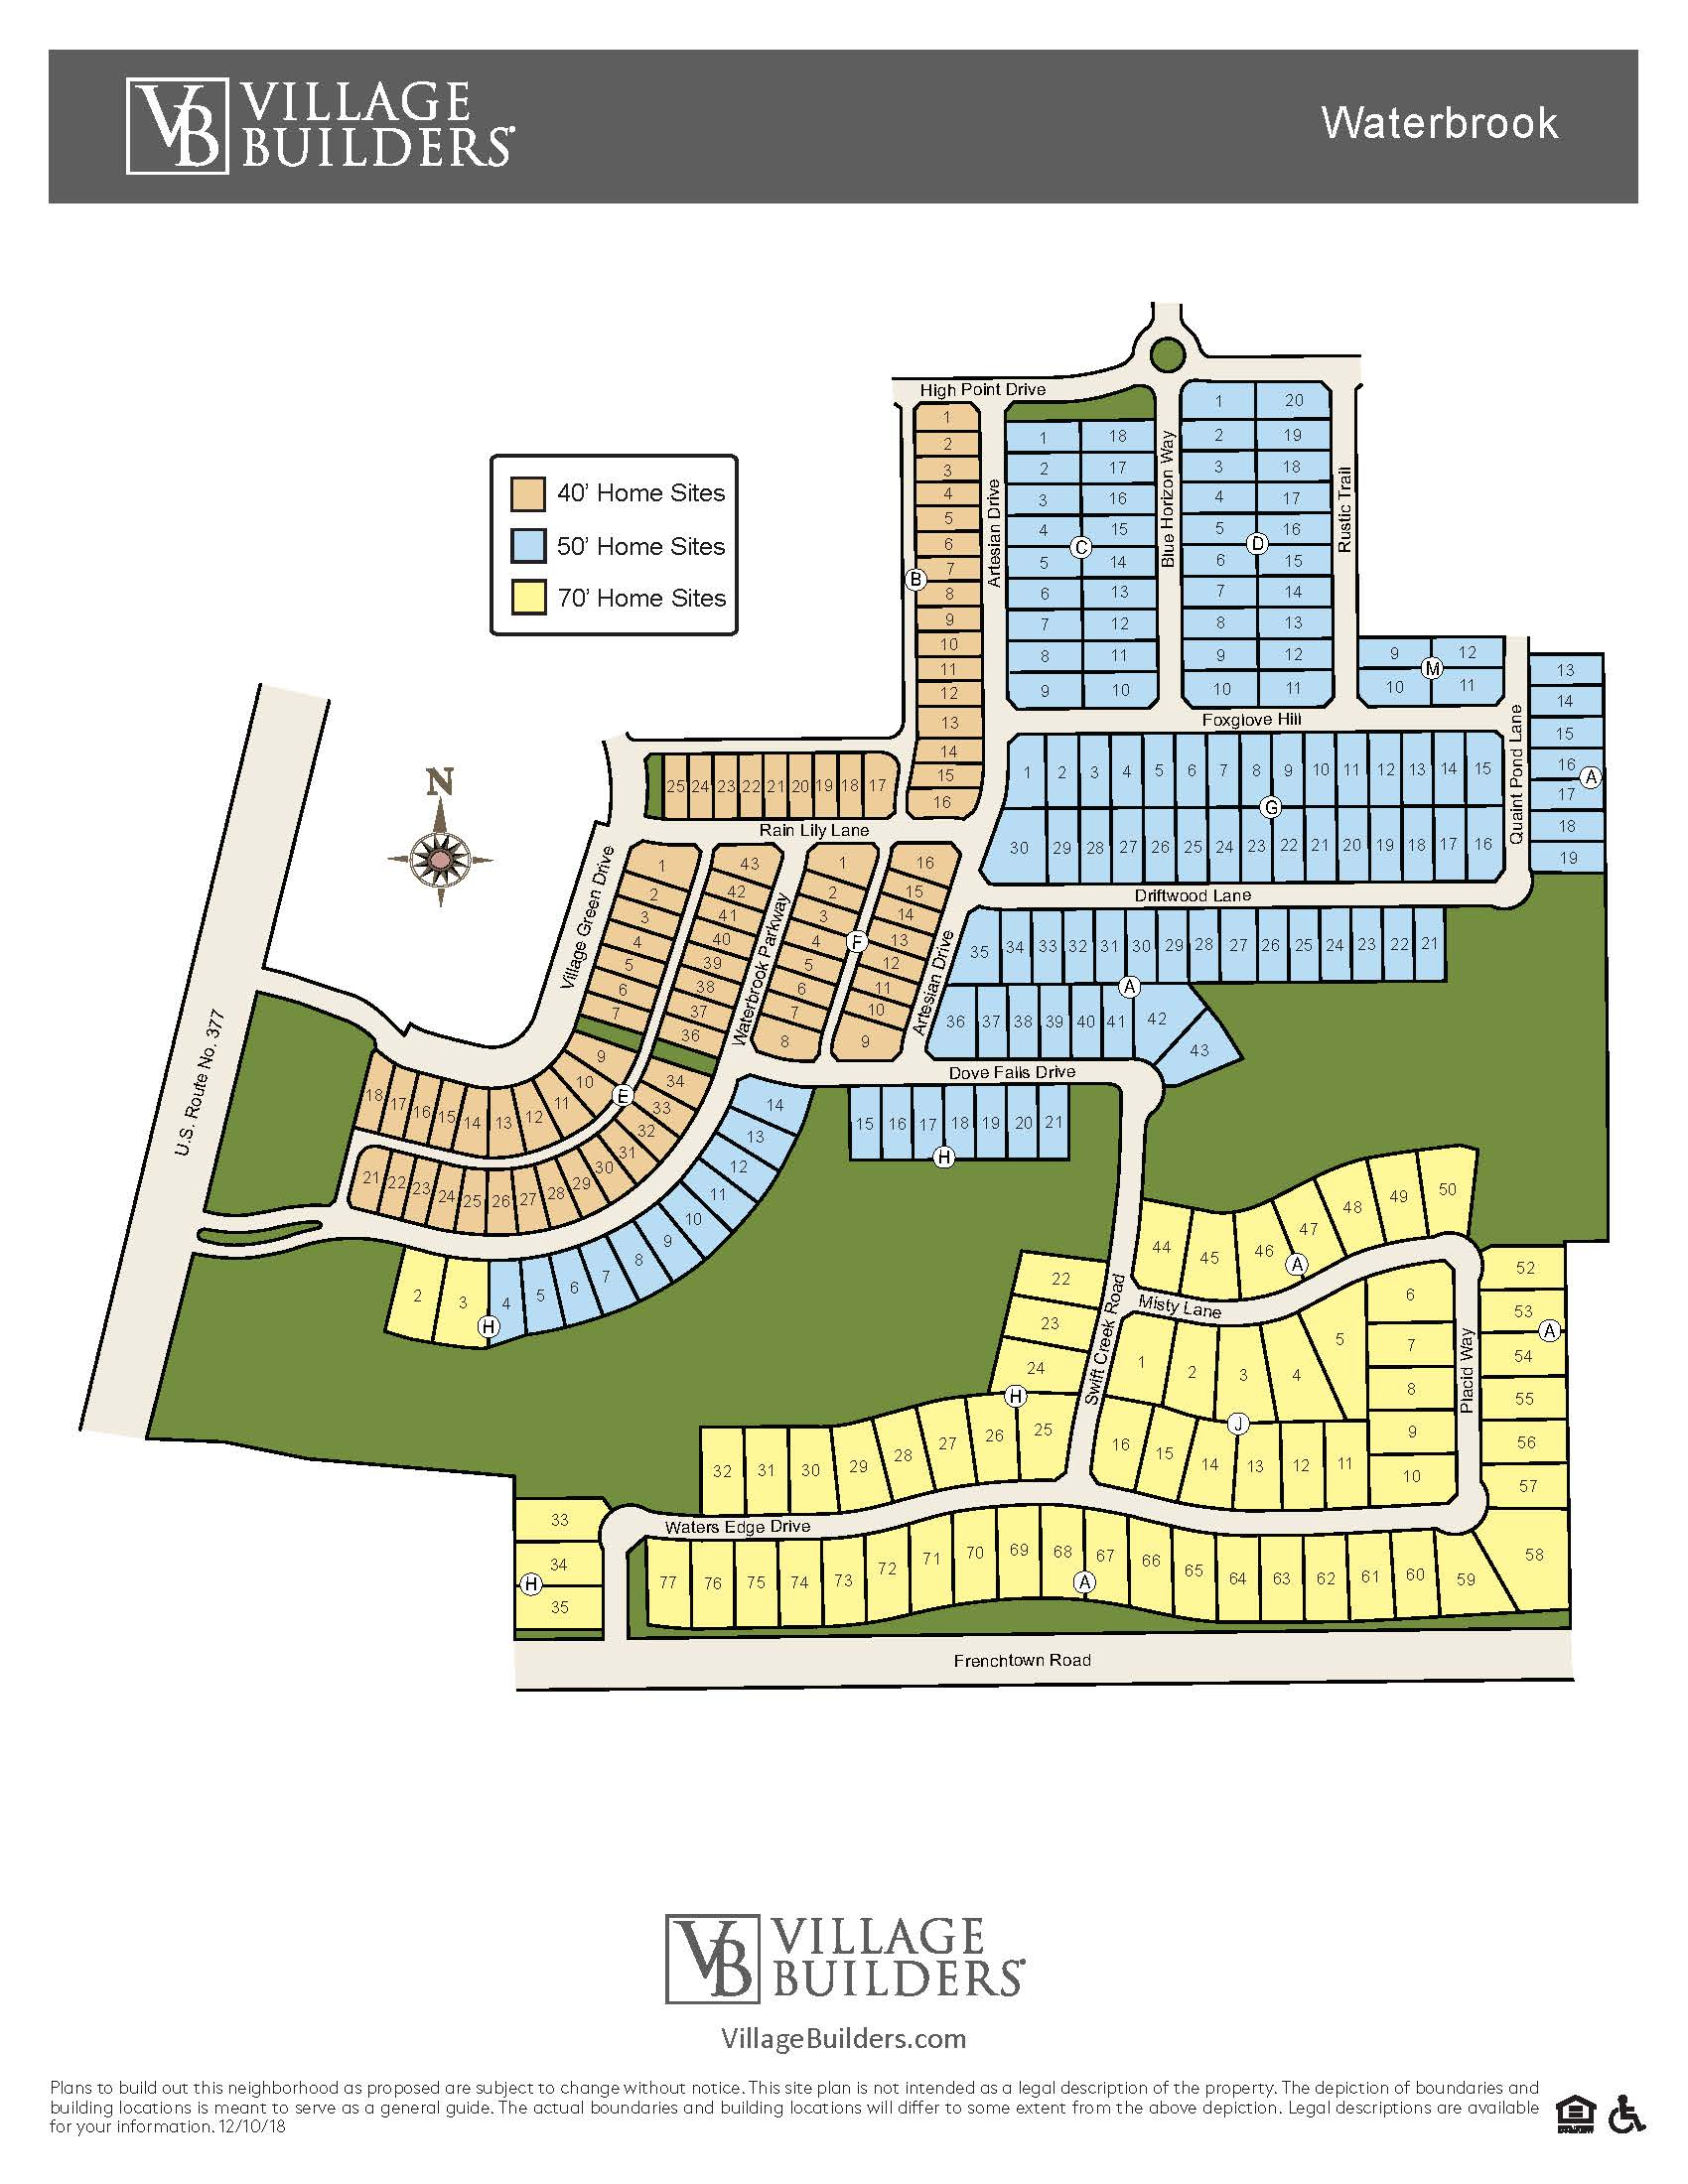 Village Builders Waterbrook New Home Site Plan Argyle TX